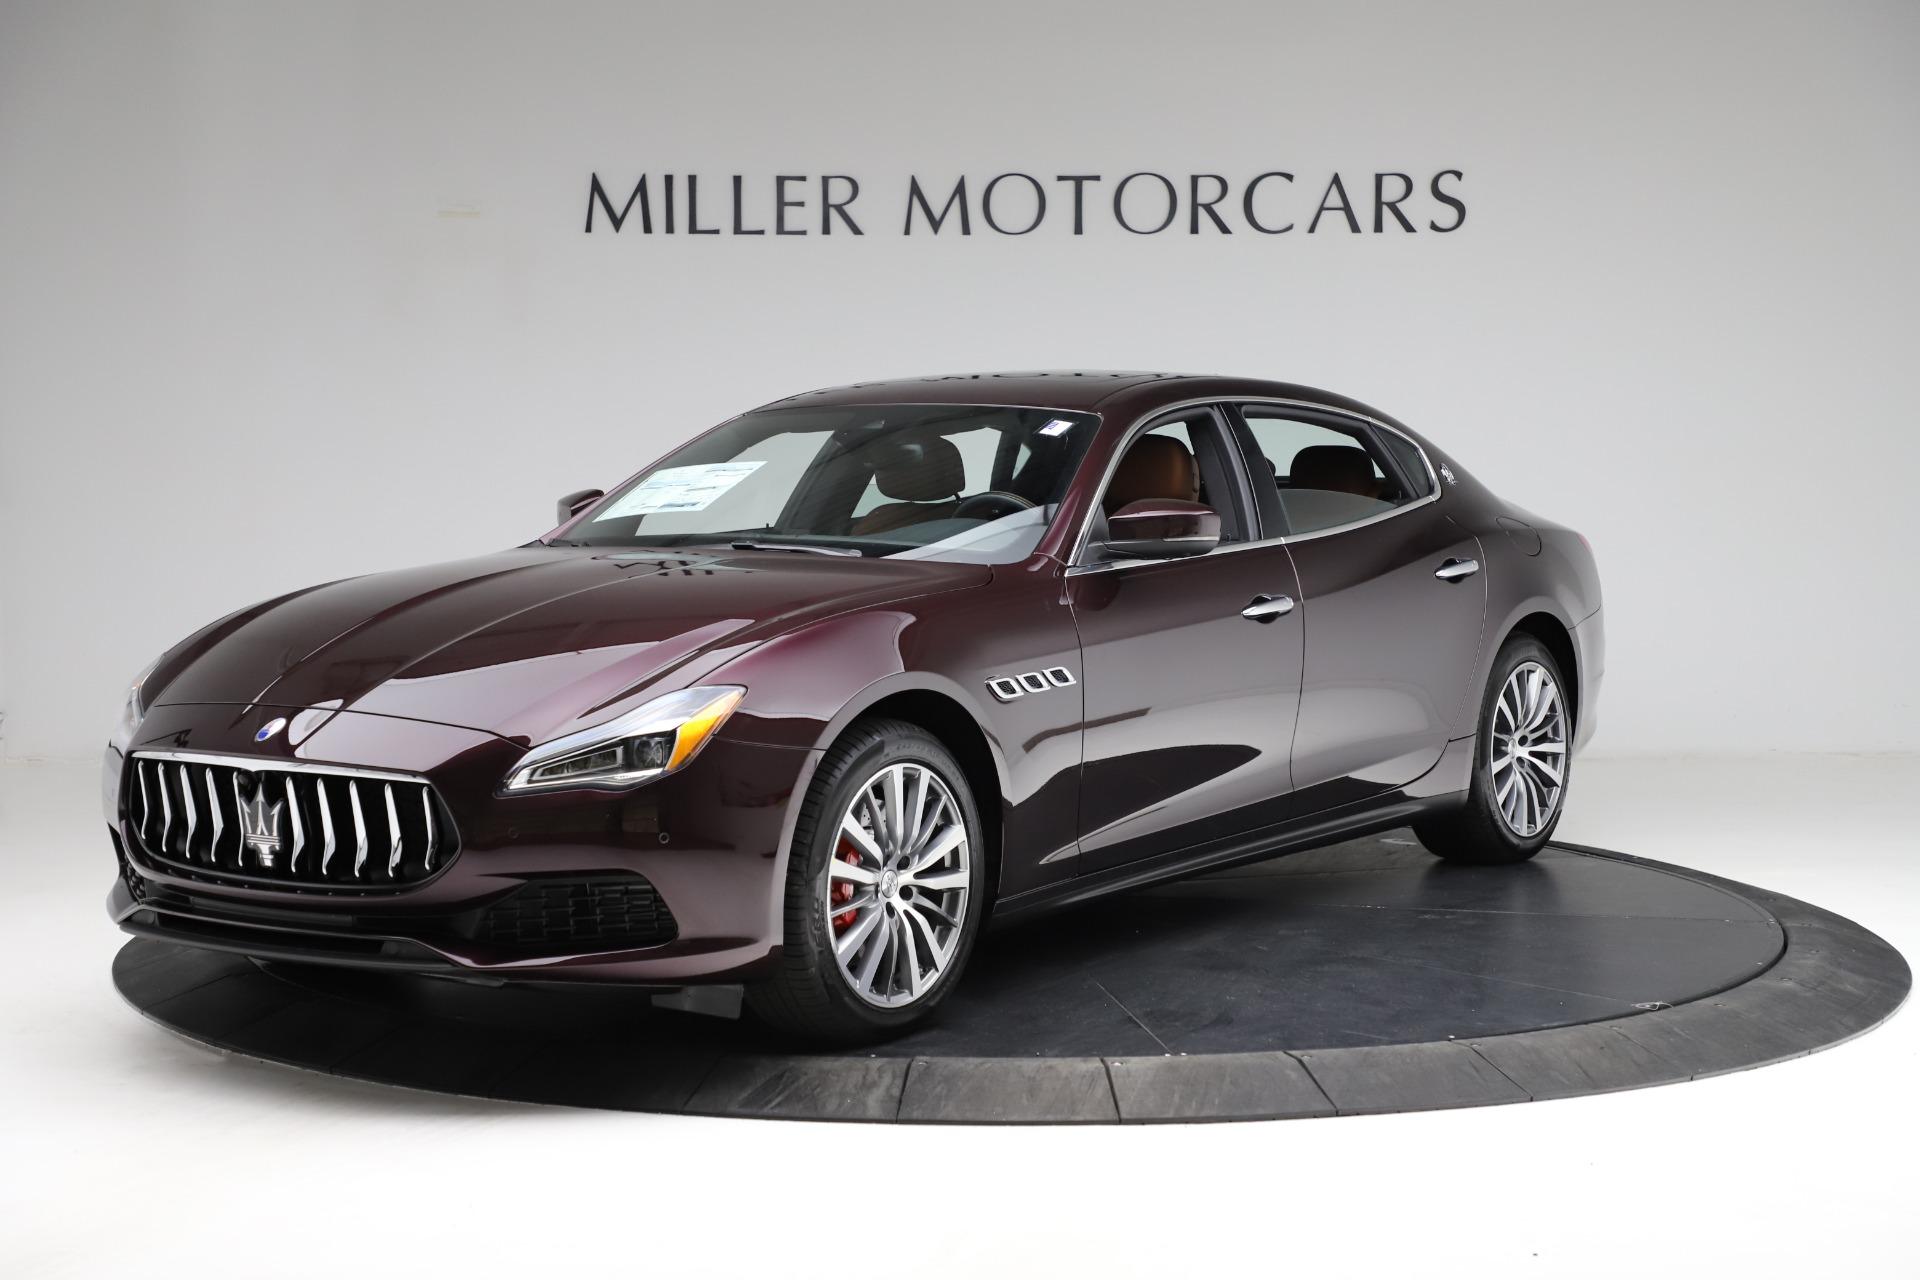 New 2021 Maserati Quattroporte S Q4 for sale Sold at Bentley Greenwich in Greenwich CT 06830 1